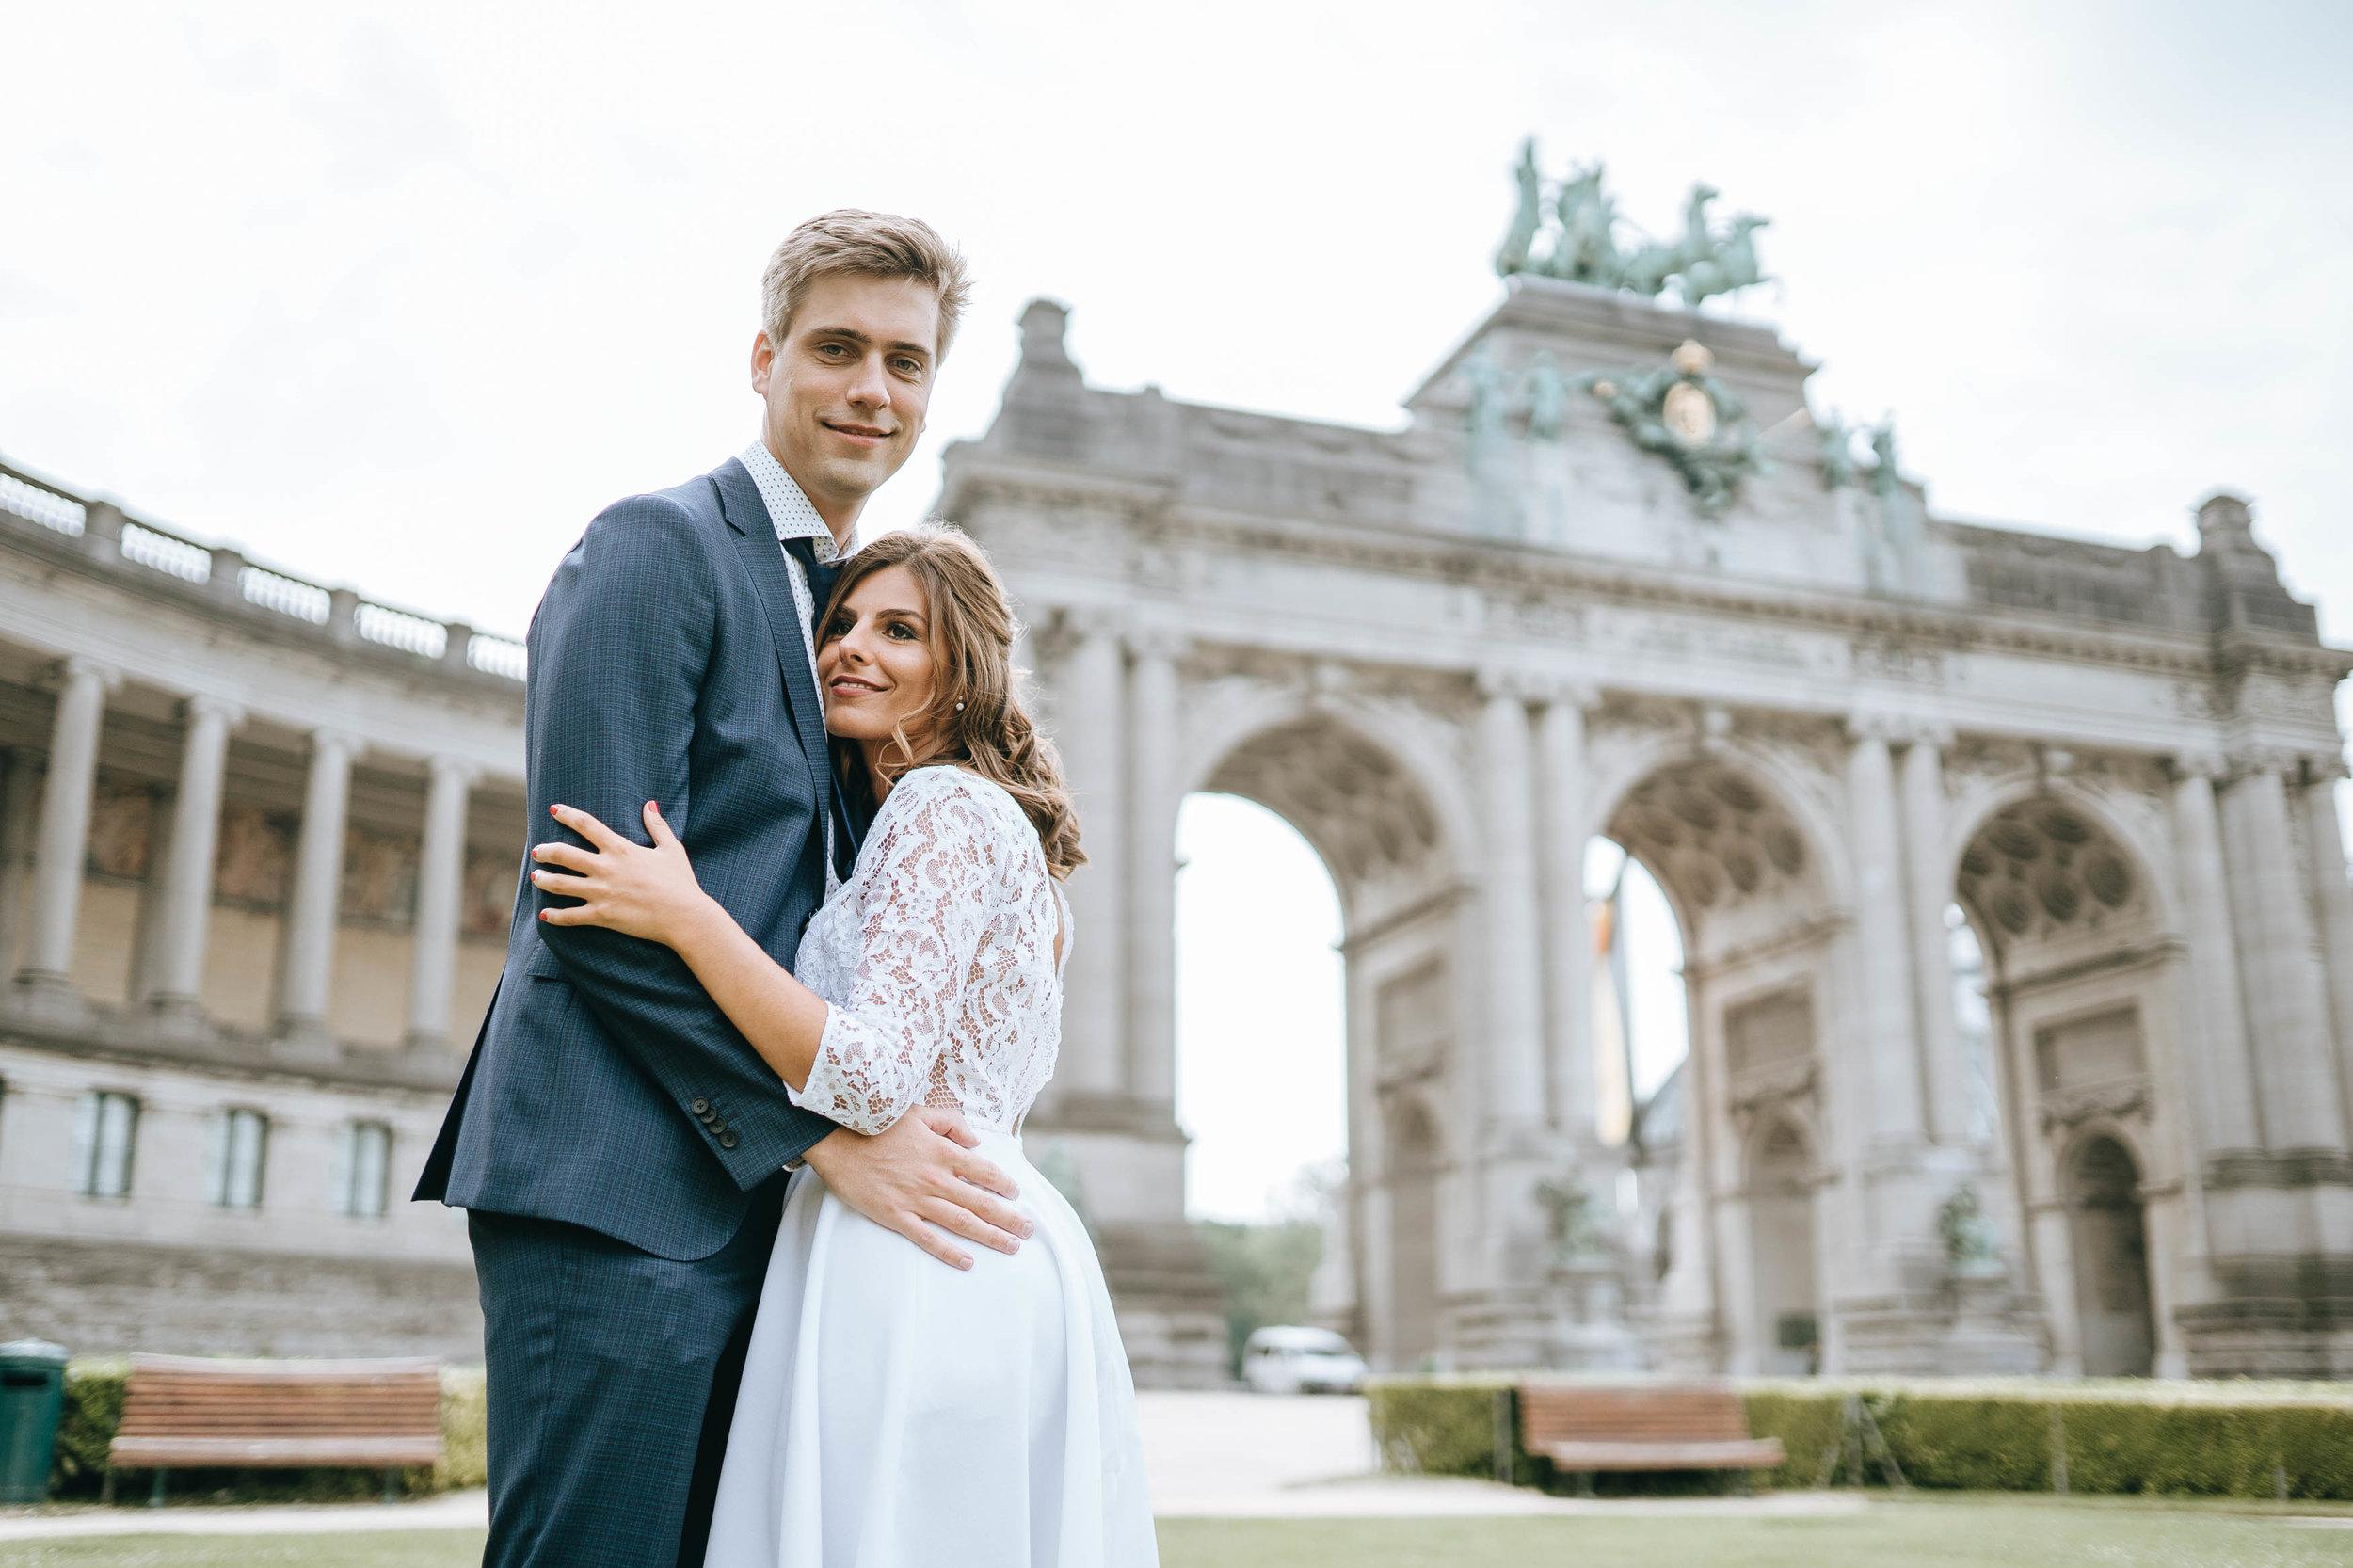 photographe_bruxelles_mariage_cinquantenaire-6.jpg